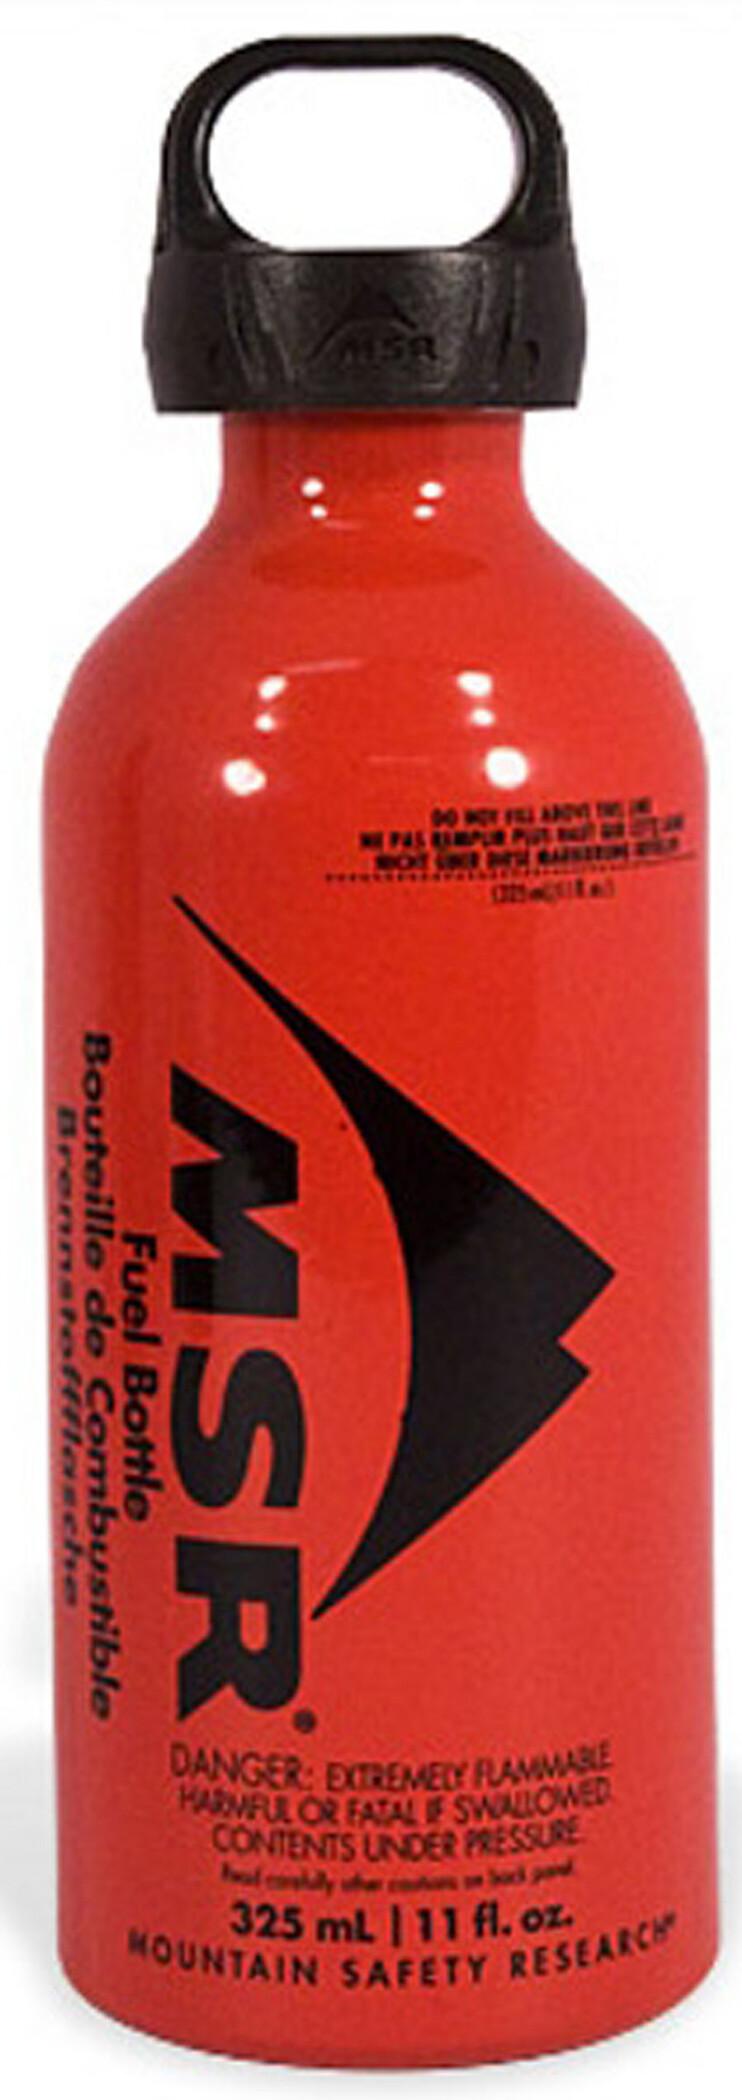 MSR Fuel Bottle 325 ml (2019) | Bottles